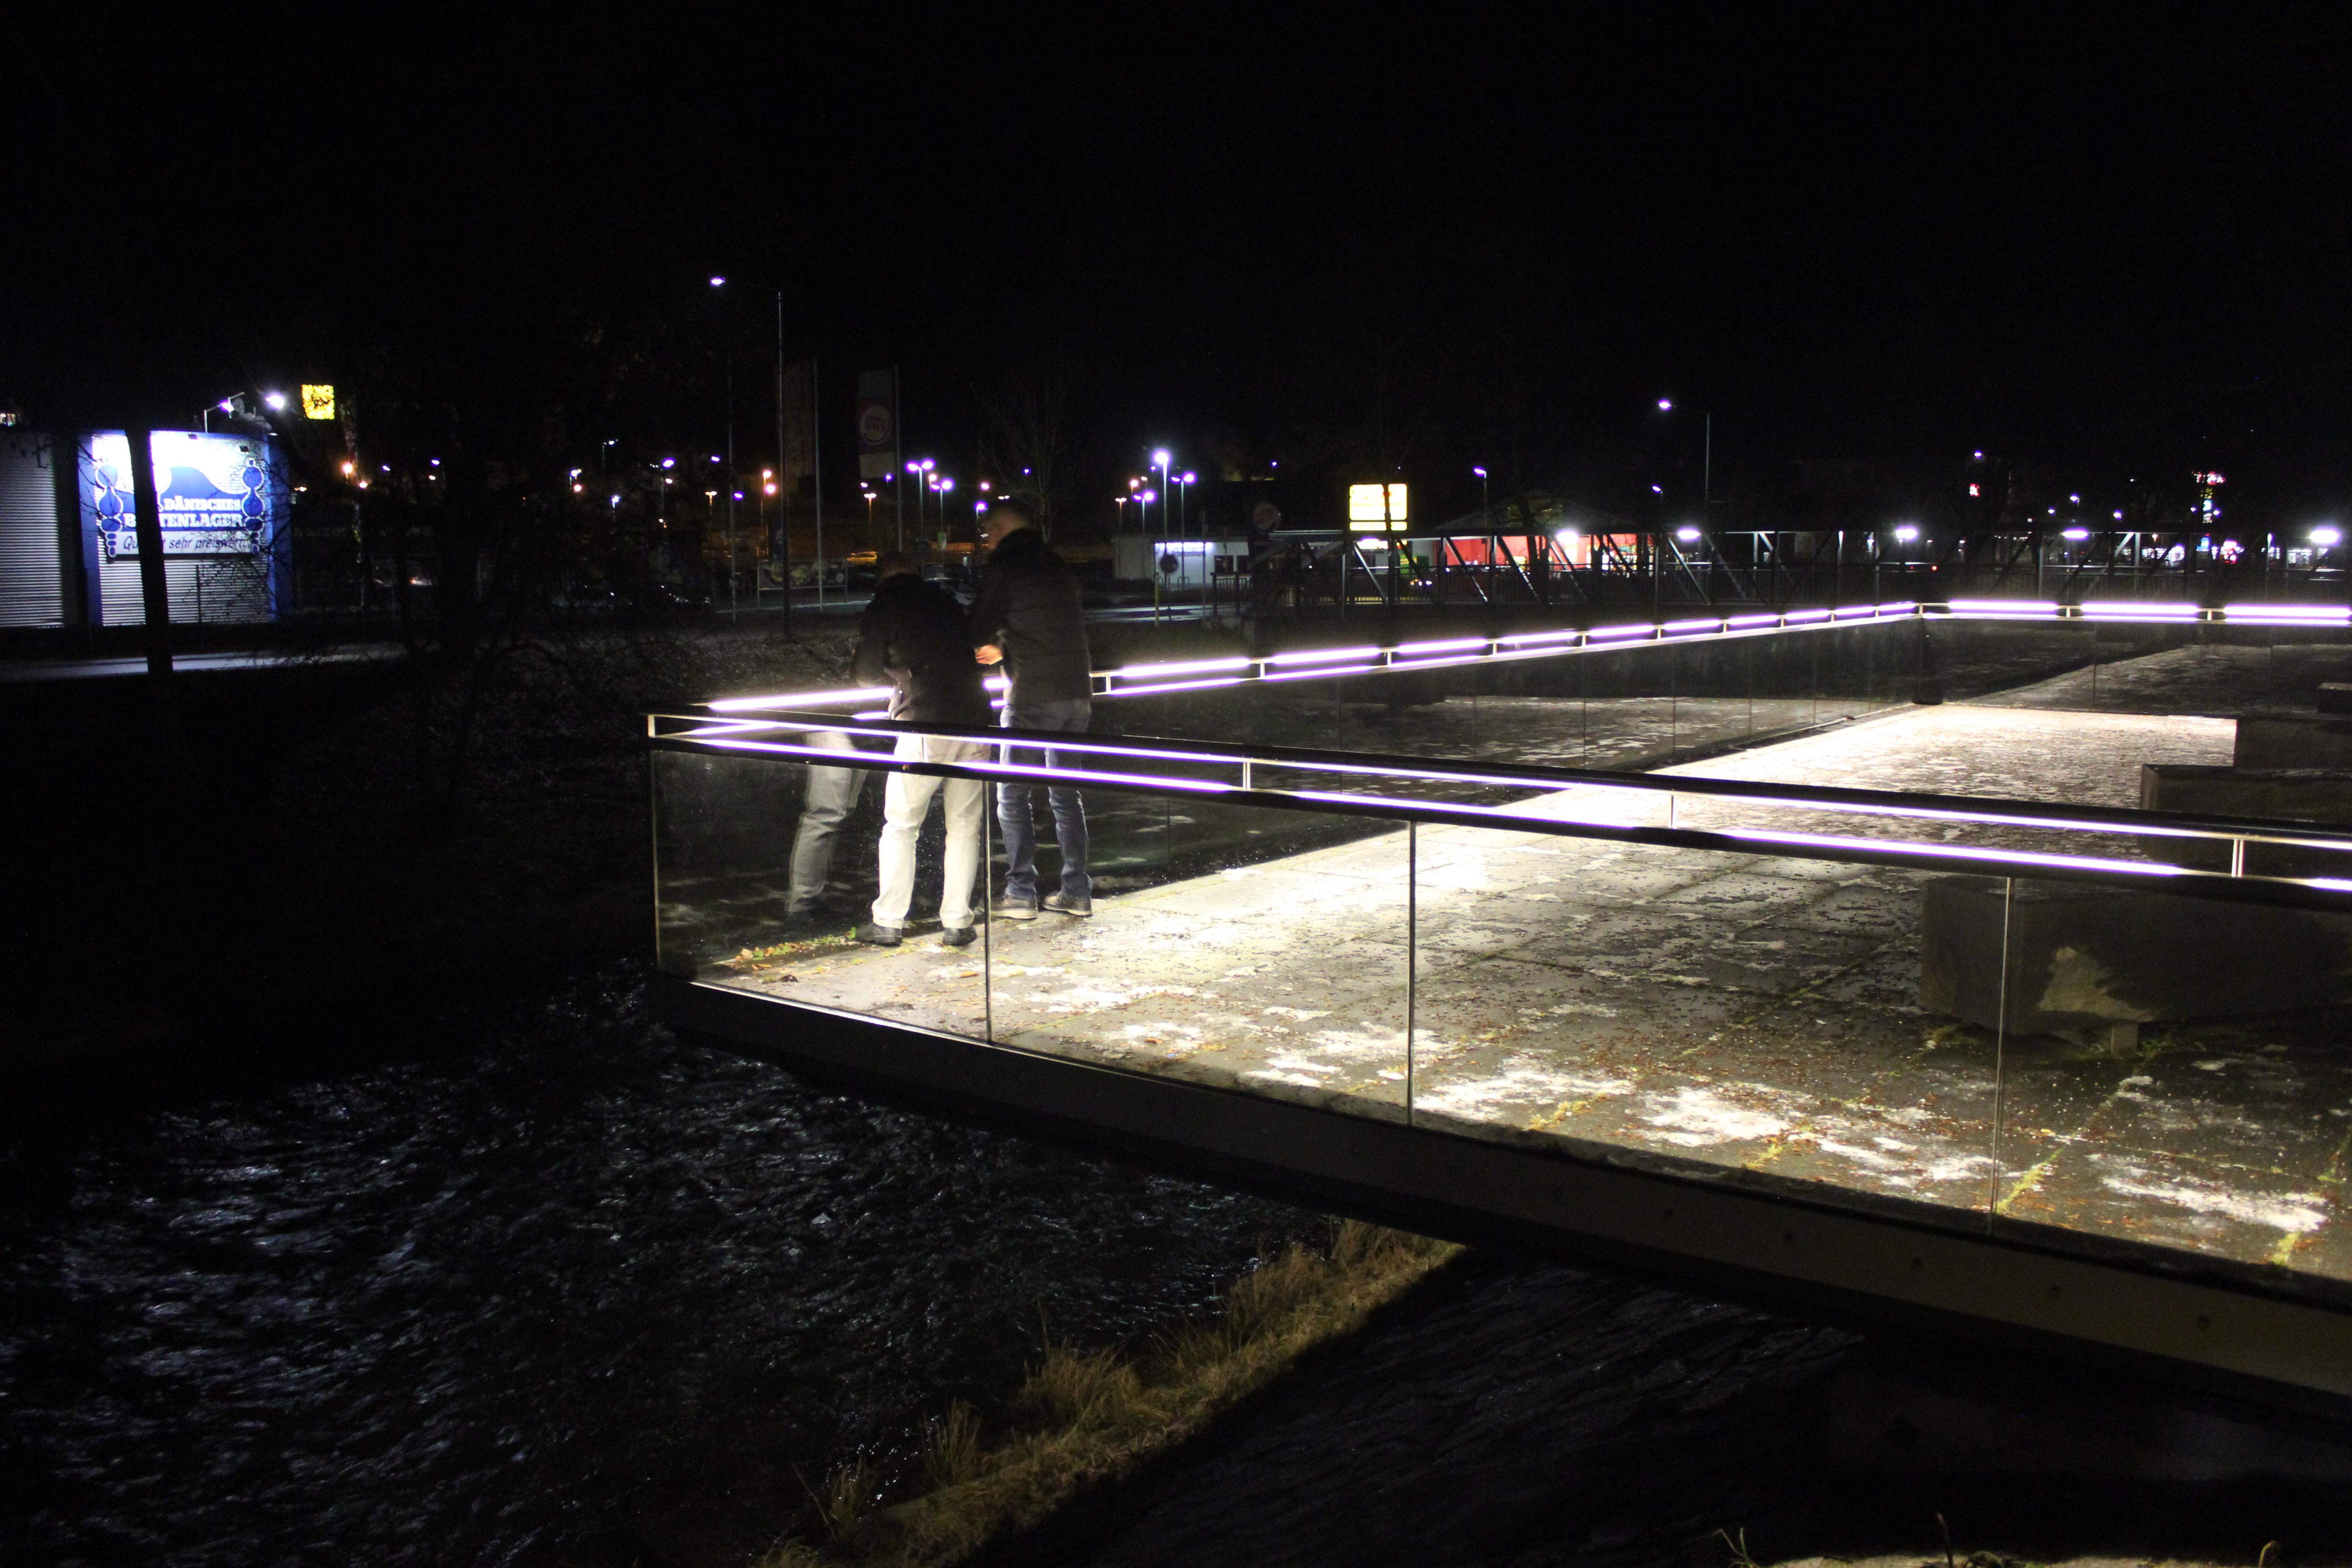 DAIDALOS® - Edelstahl Handlauf mit Glasbrüstung - Oberndorf am Neckar